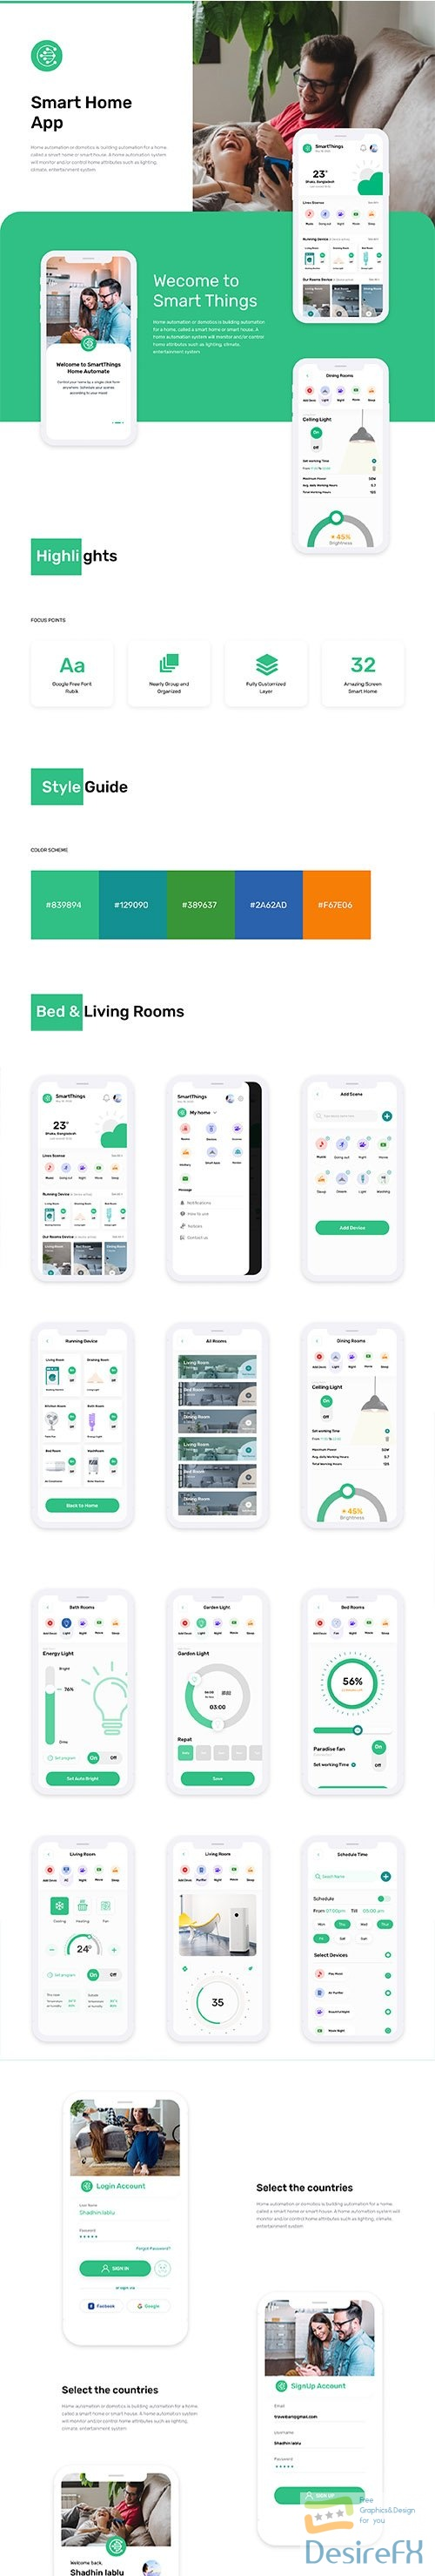 Smart Home Things - UI8